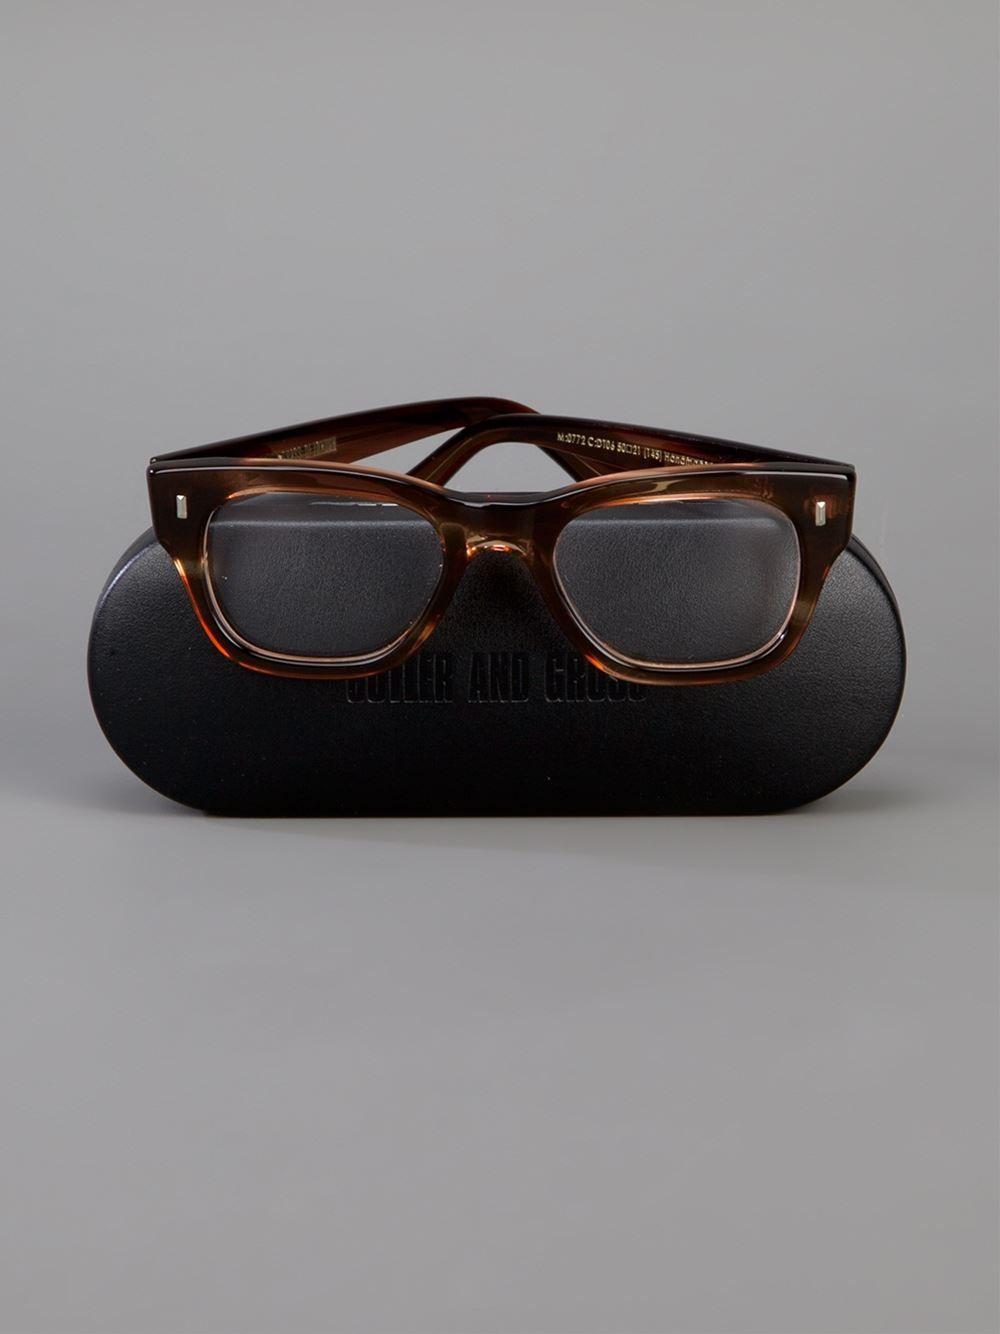 cef1abae1a428 Cutler   Gross Wayfarer Glasses - Mode De Vue - Farfetch.com ...